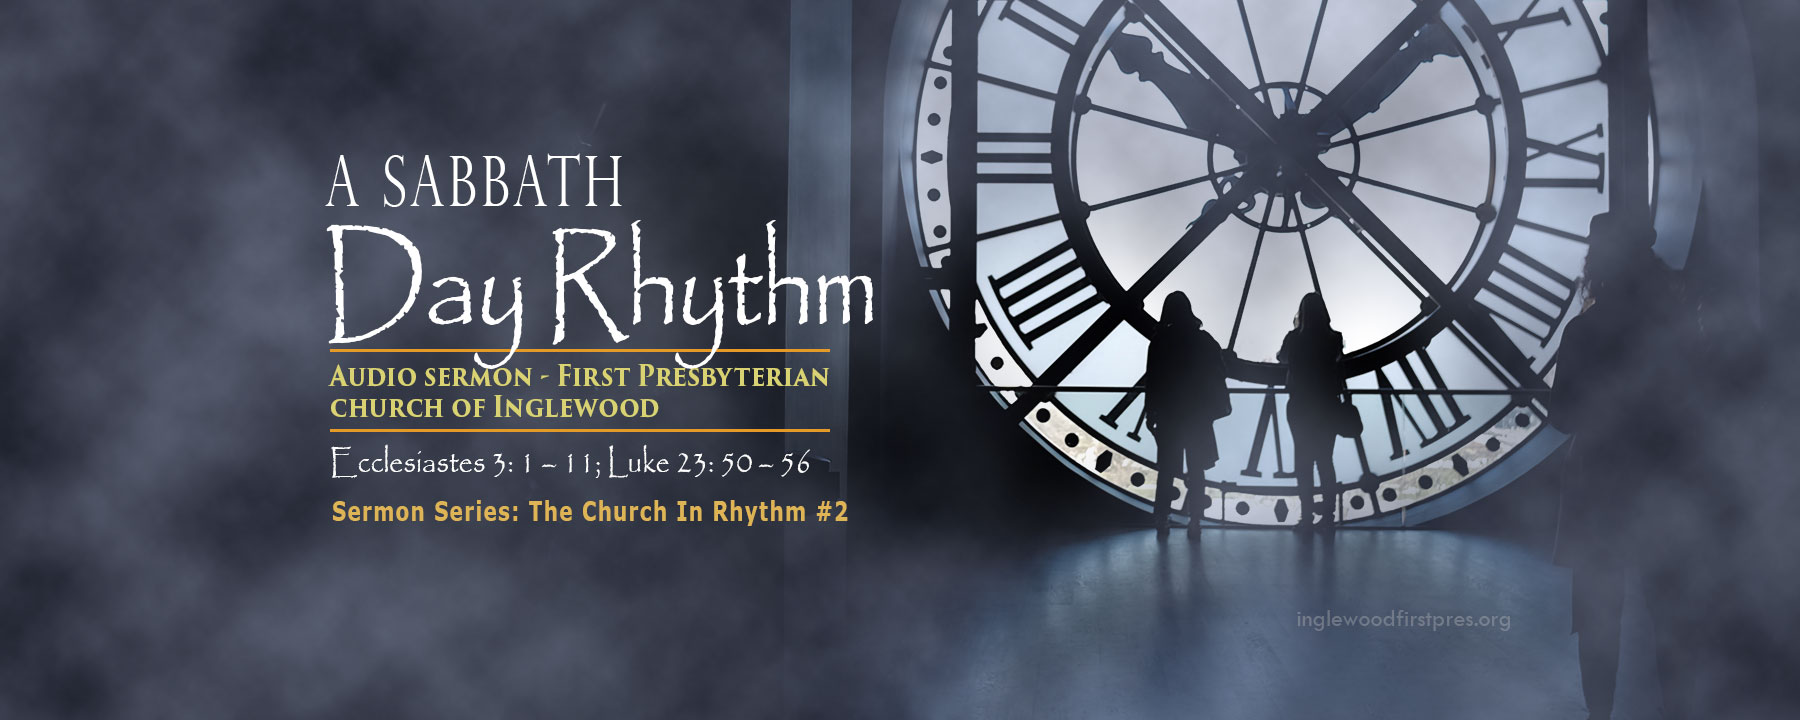 AUDIO SERMON: A Sabbath Day Rhythm by Rev. Dr. Harold E. Kidd (Ecclesiastes 3: 1 – 11; Luke 23: 50 – 56)